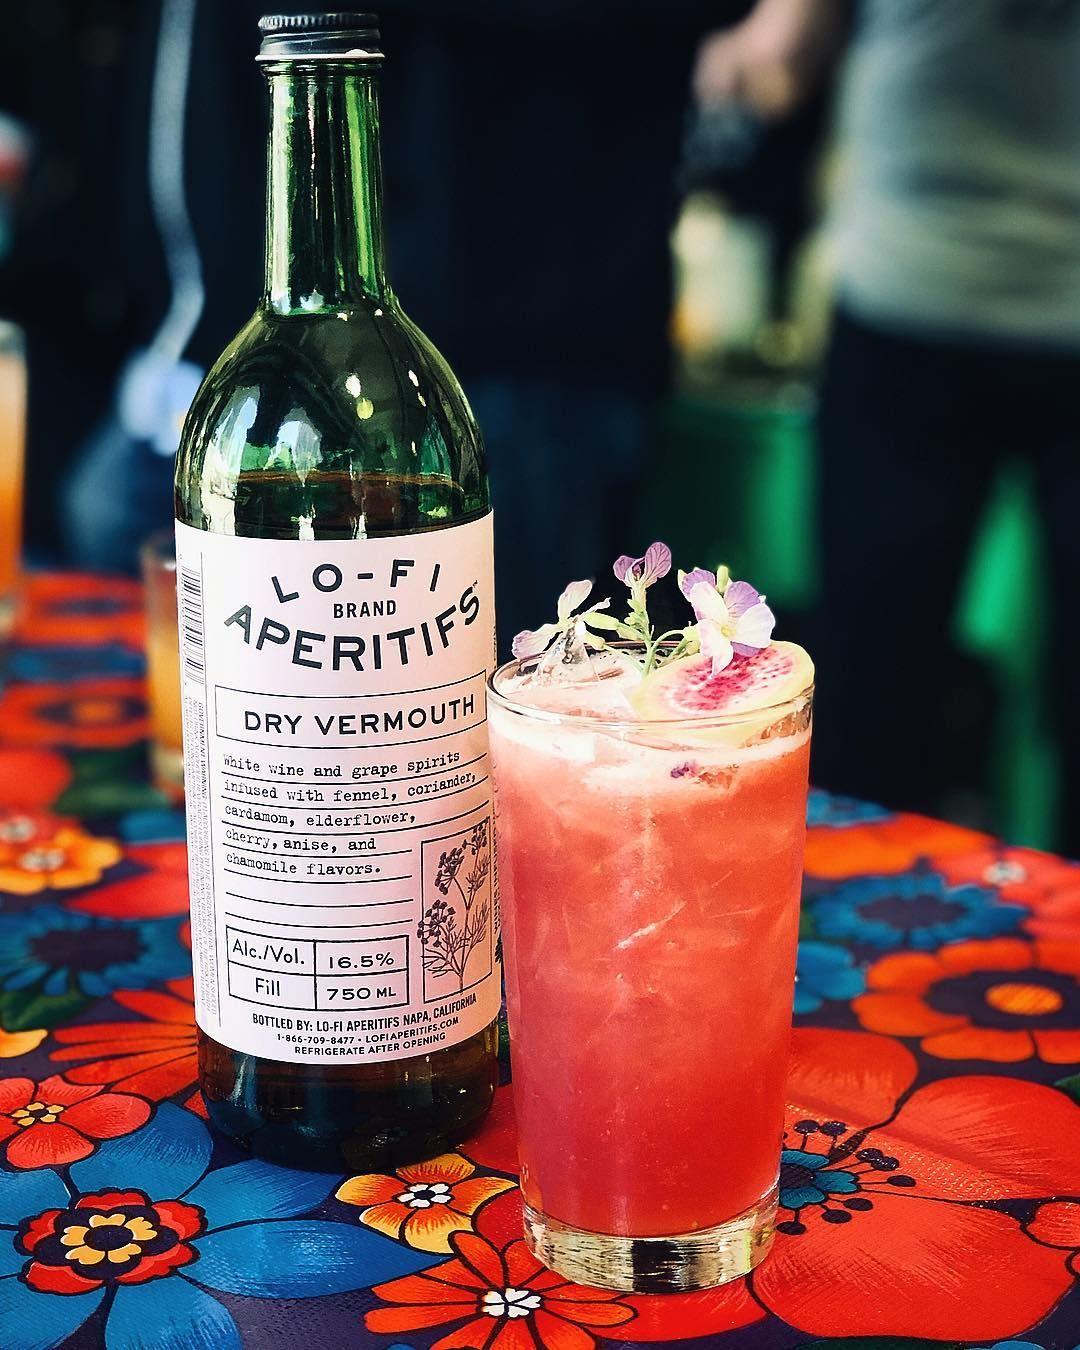 Pin By Lo Fi Aperitifs On Lo Fi Dry Vermouth Grape Spirit Flavors Aperitif